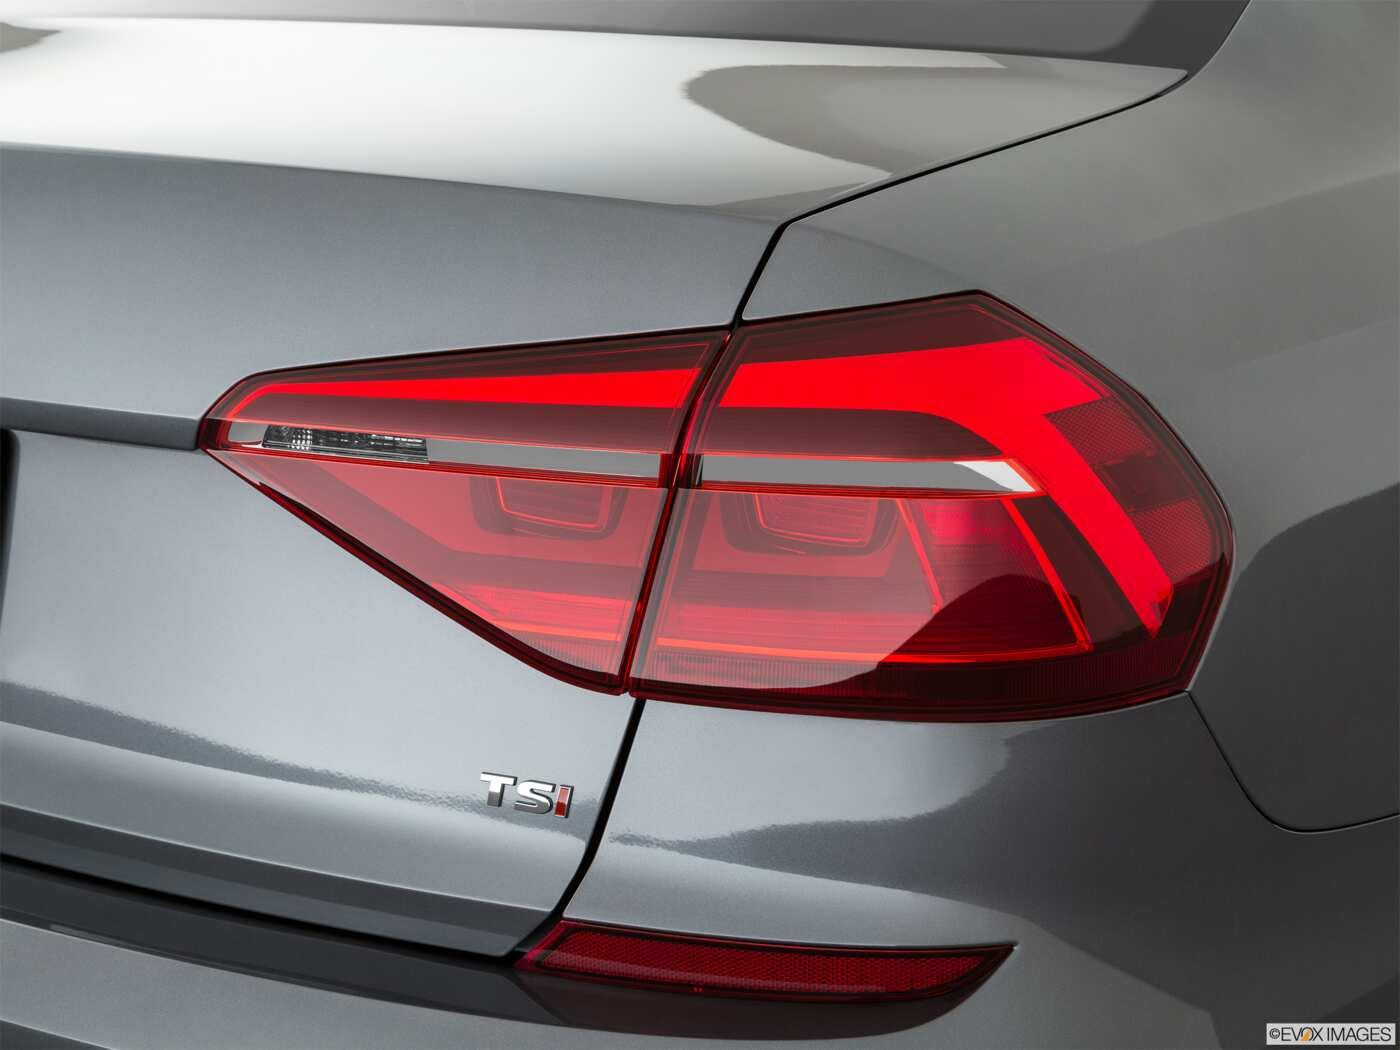 2019 Volkswagen Passat Prices Reviews Incentives Truecar 2005 Kia Sorento Wiring System Passenger Side Taillight